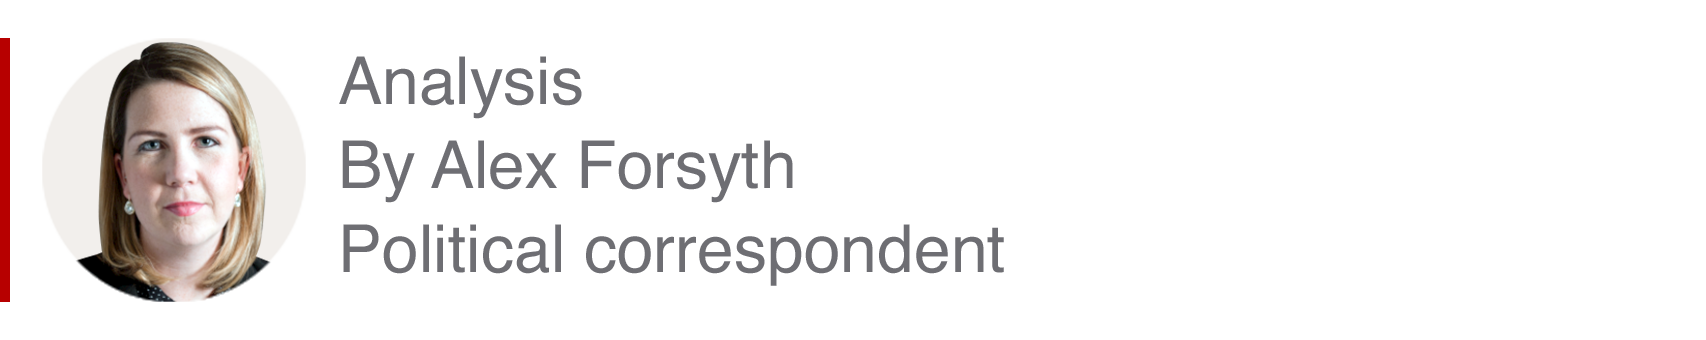 Analysis box by Alex Forsyth, political correspondent